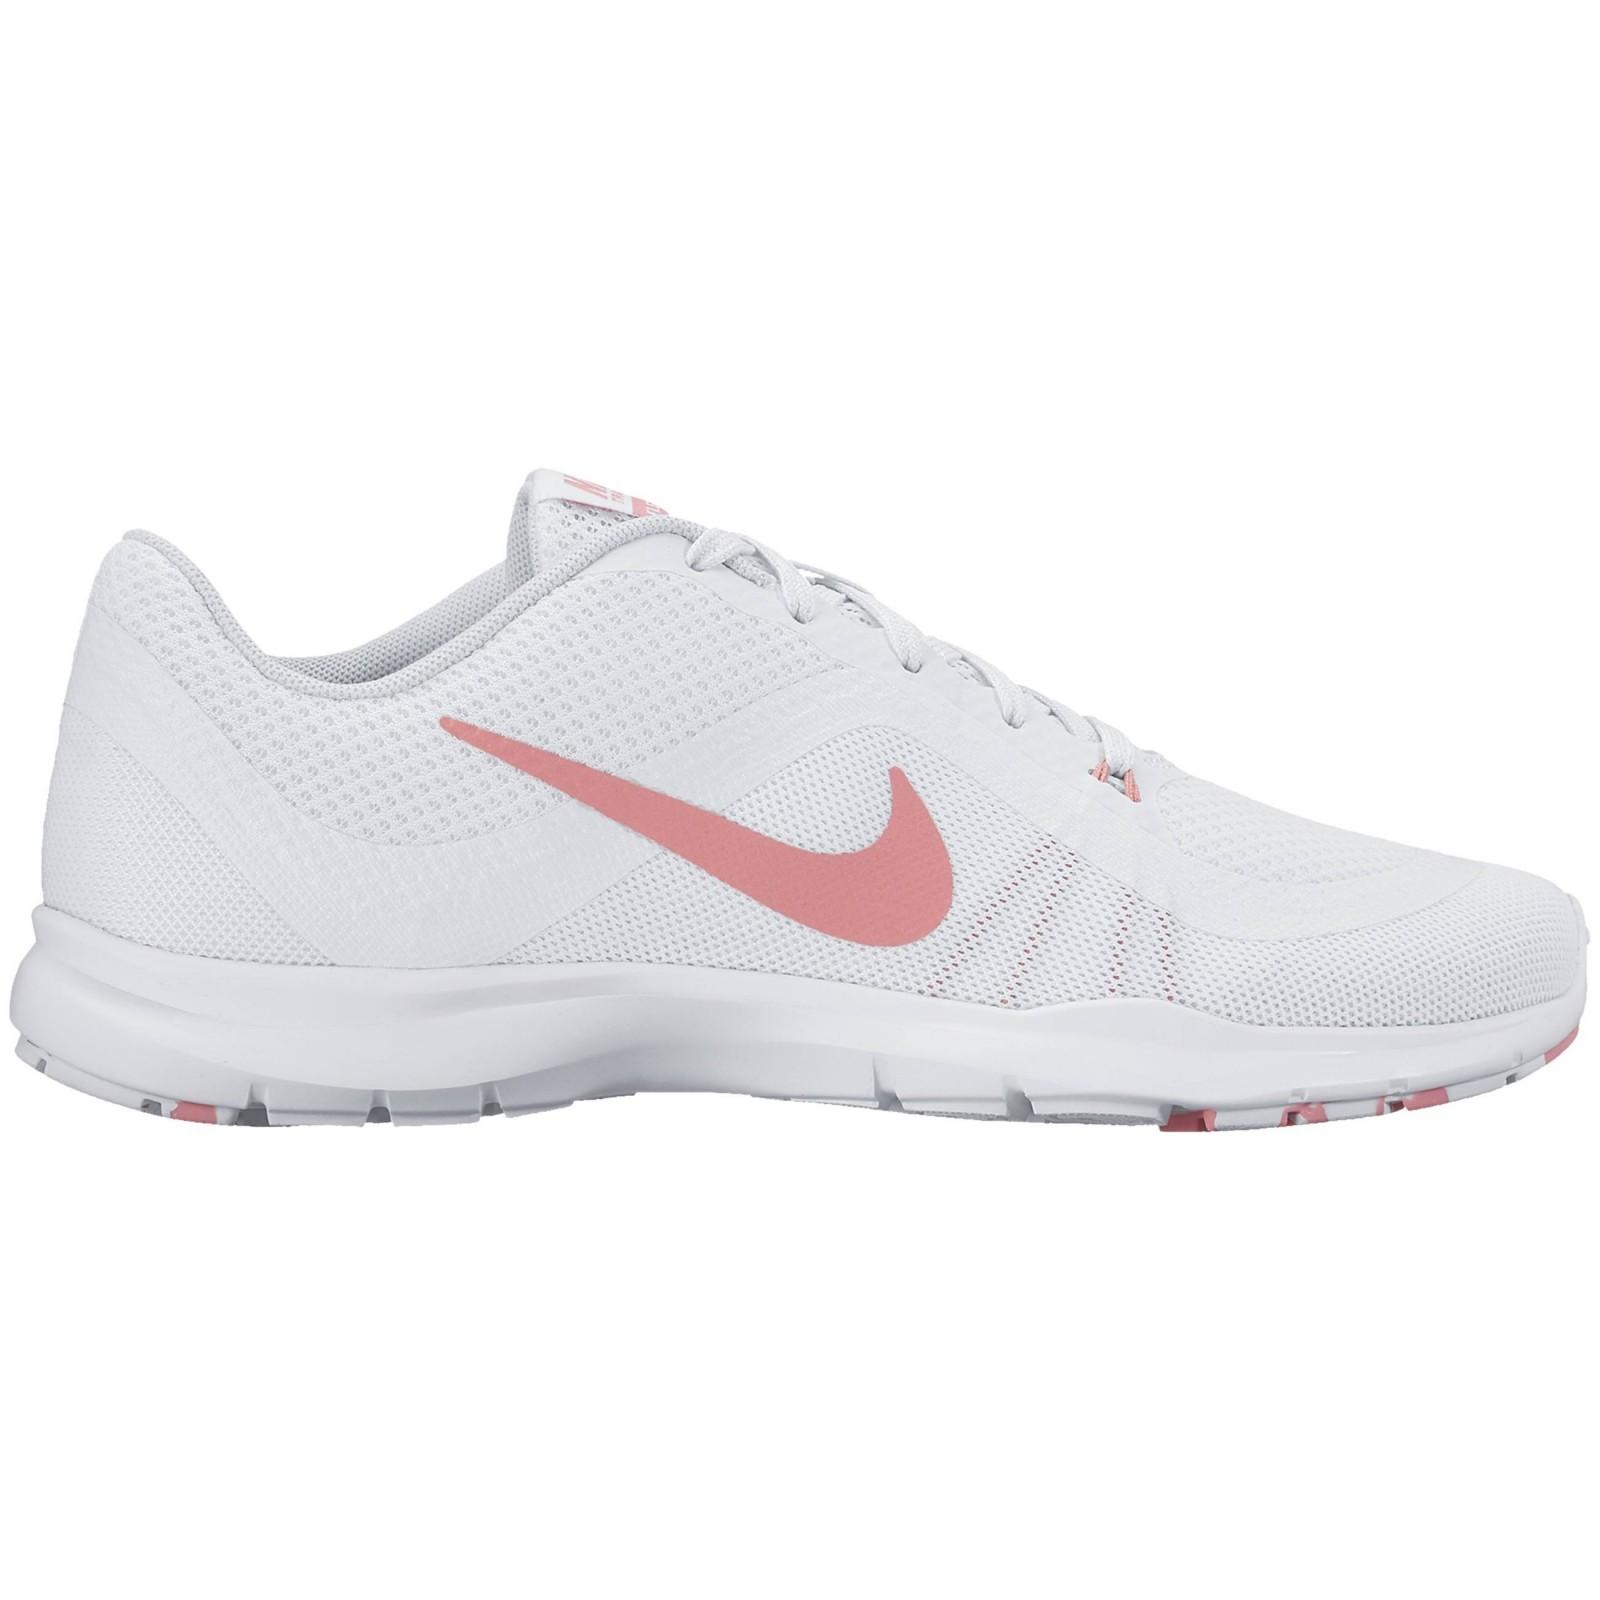 Dámské fitness boty Nike WMNS FLEX TRAINER 6 PREM  5784465597